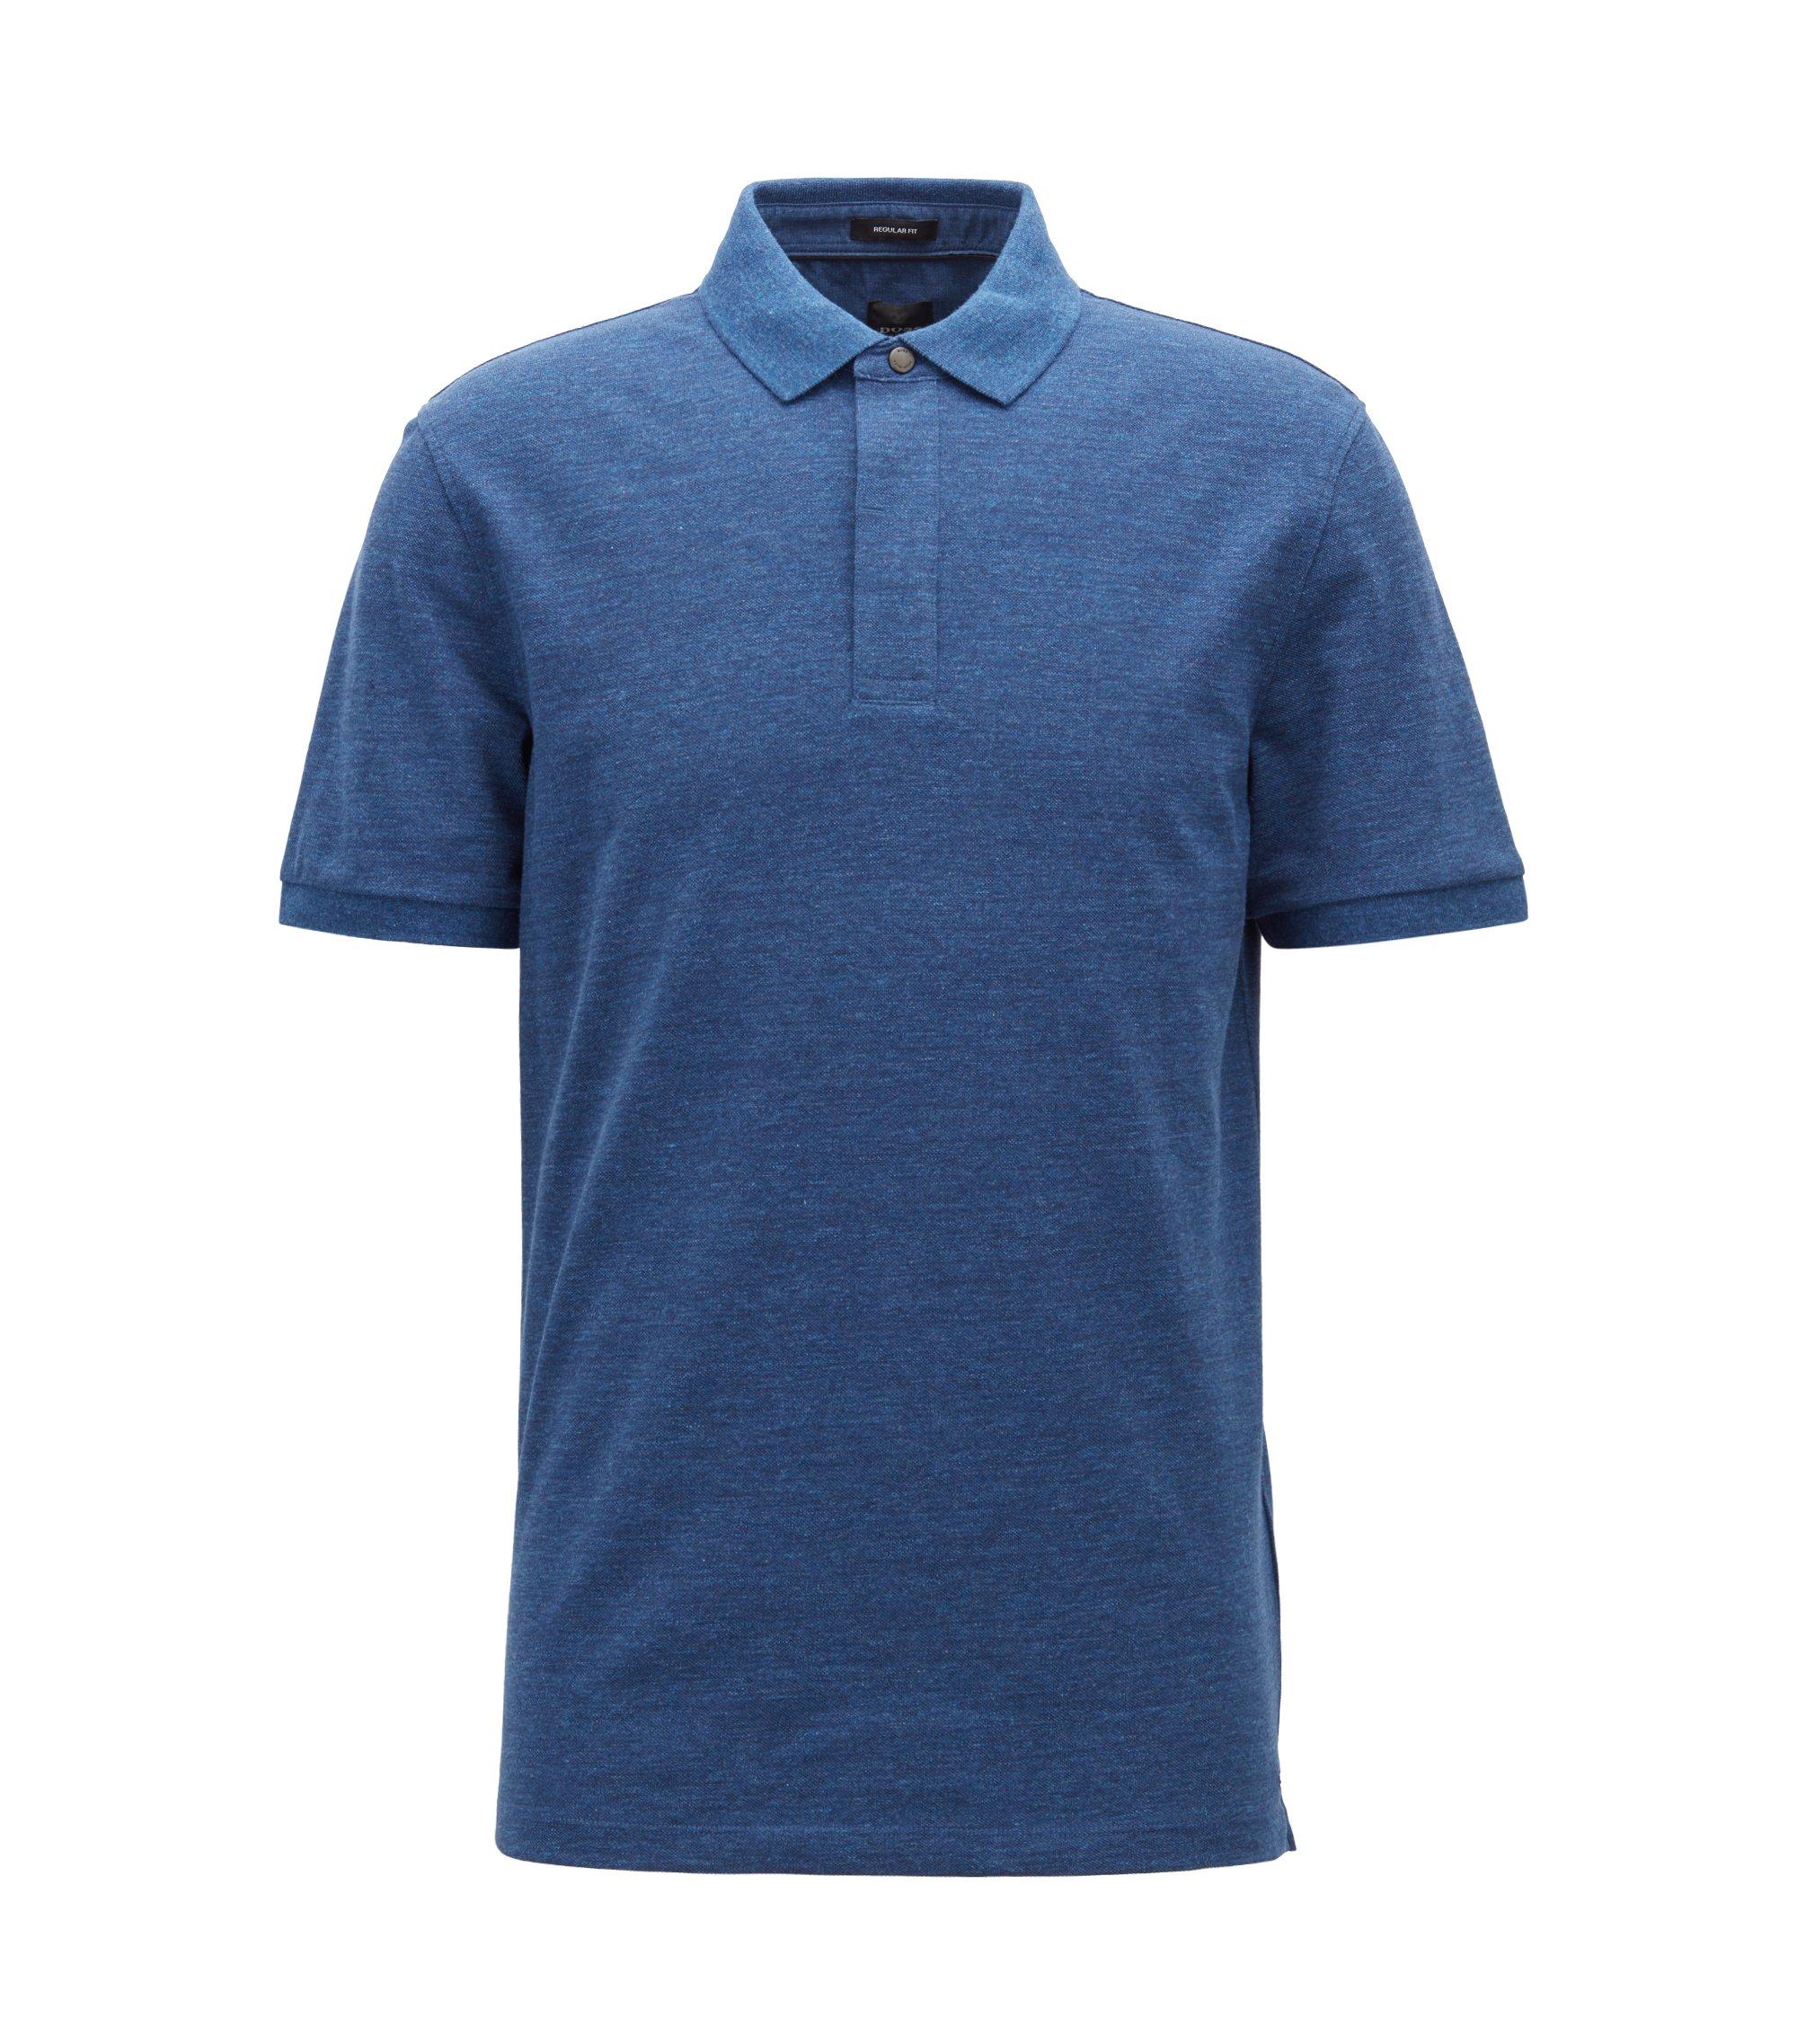 Denim-effect polo shirt with press-stud closure, Open Blue